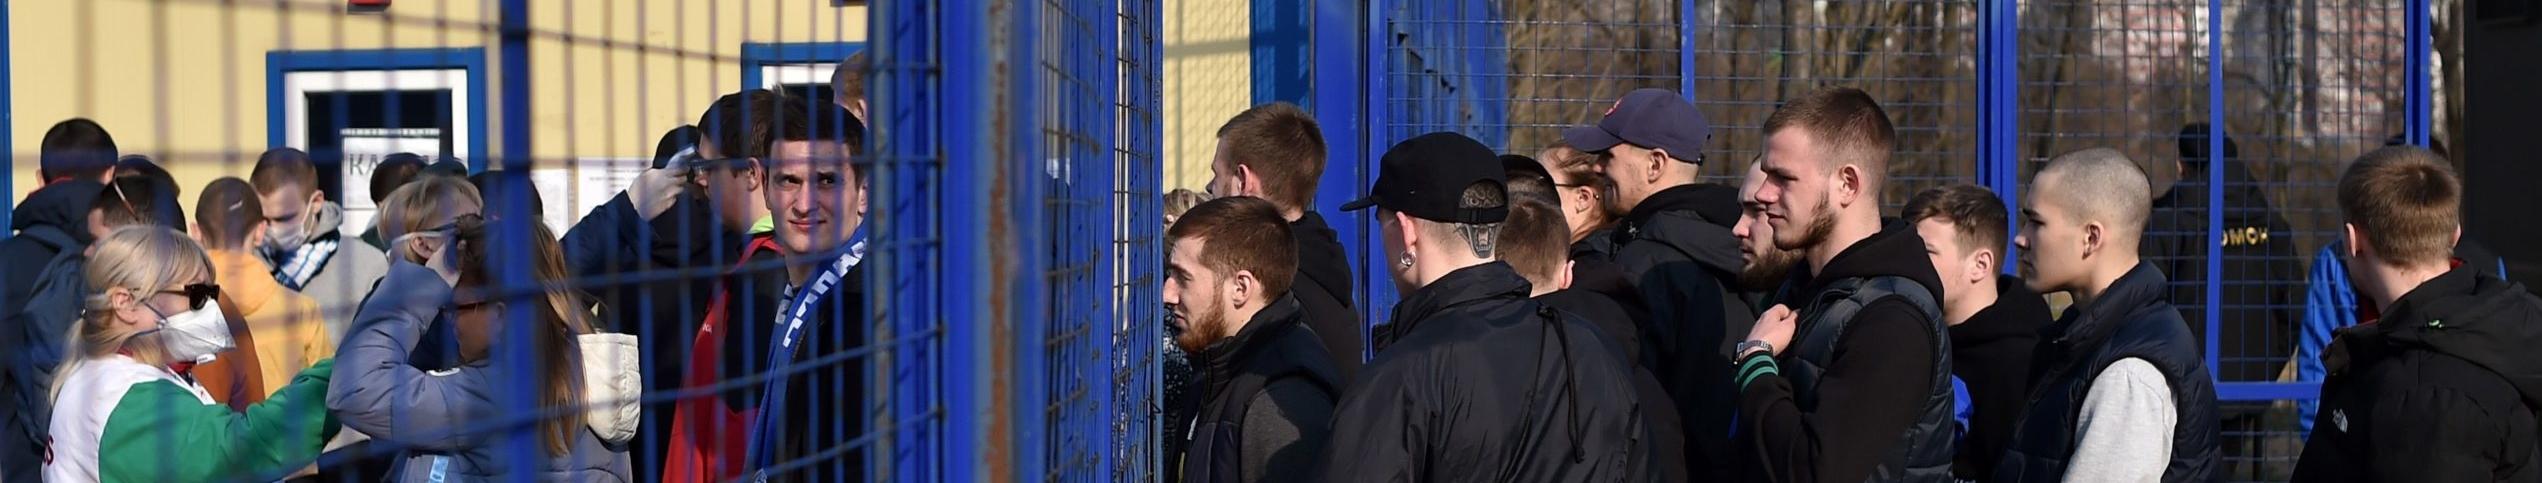 FC Minsk-Torpedo Zhodino, c'è aria di sorpasso nel lunch match della Vysshaya Liga